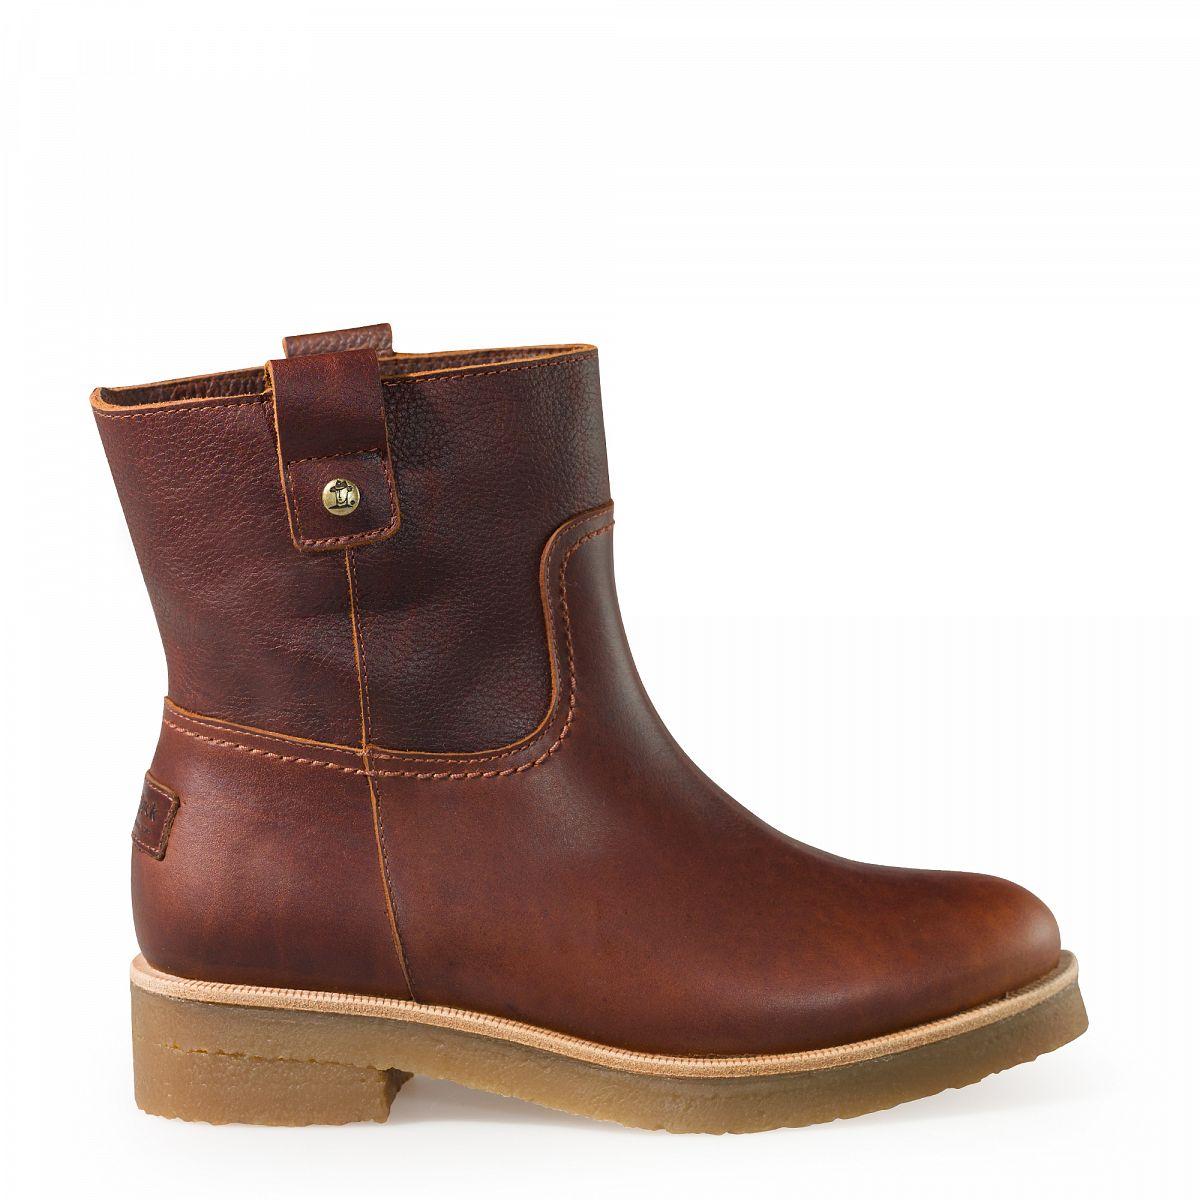 Womens ankle boots croacia bark panama jack 174 online shop